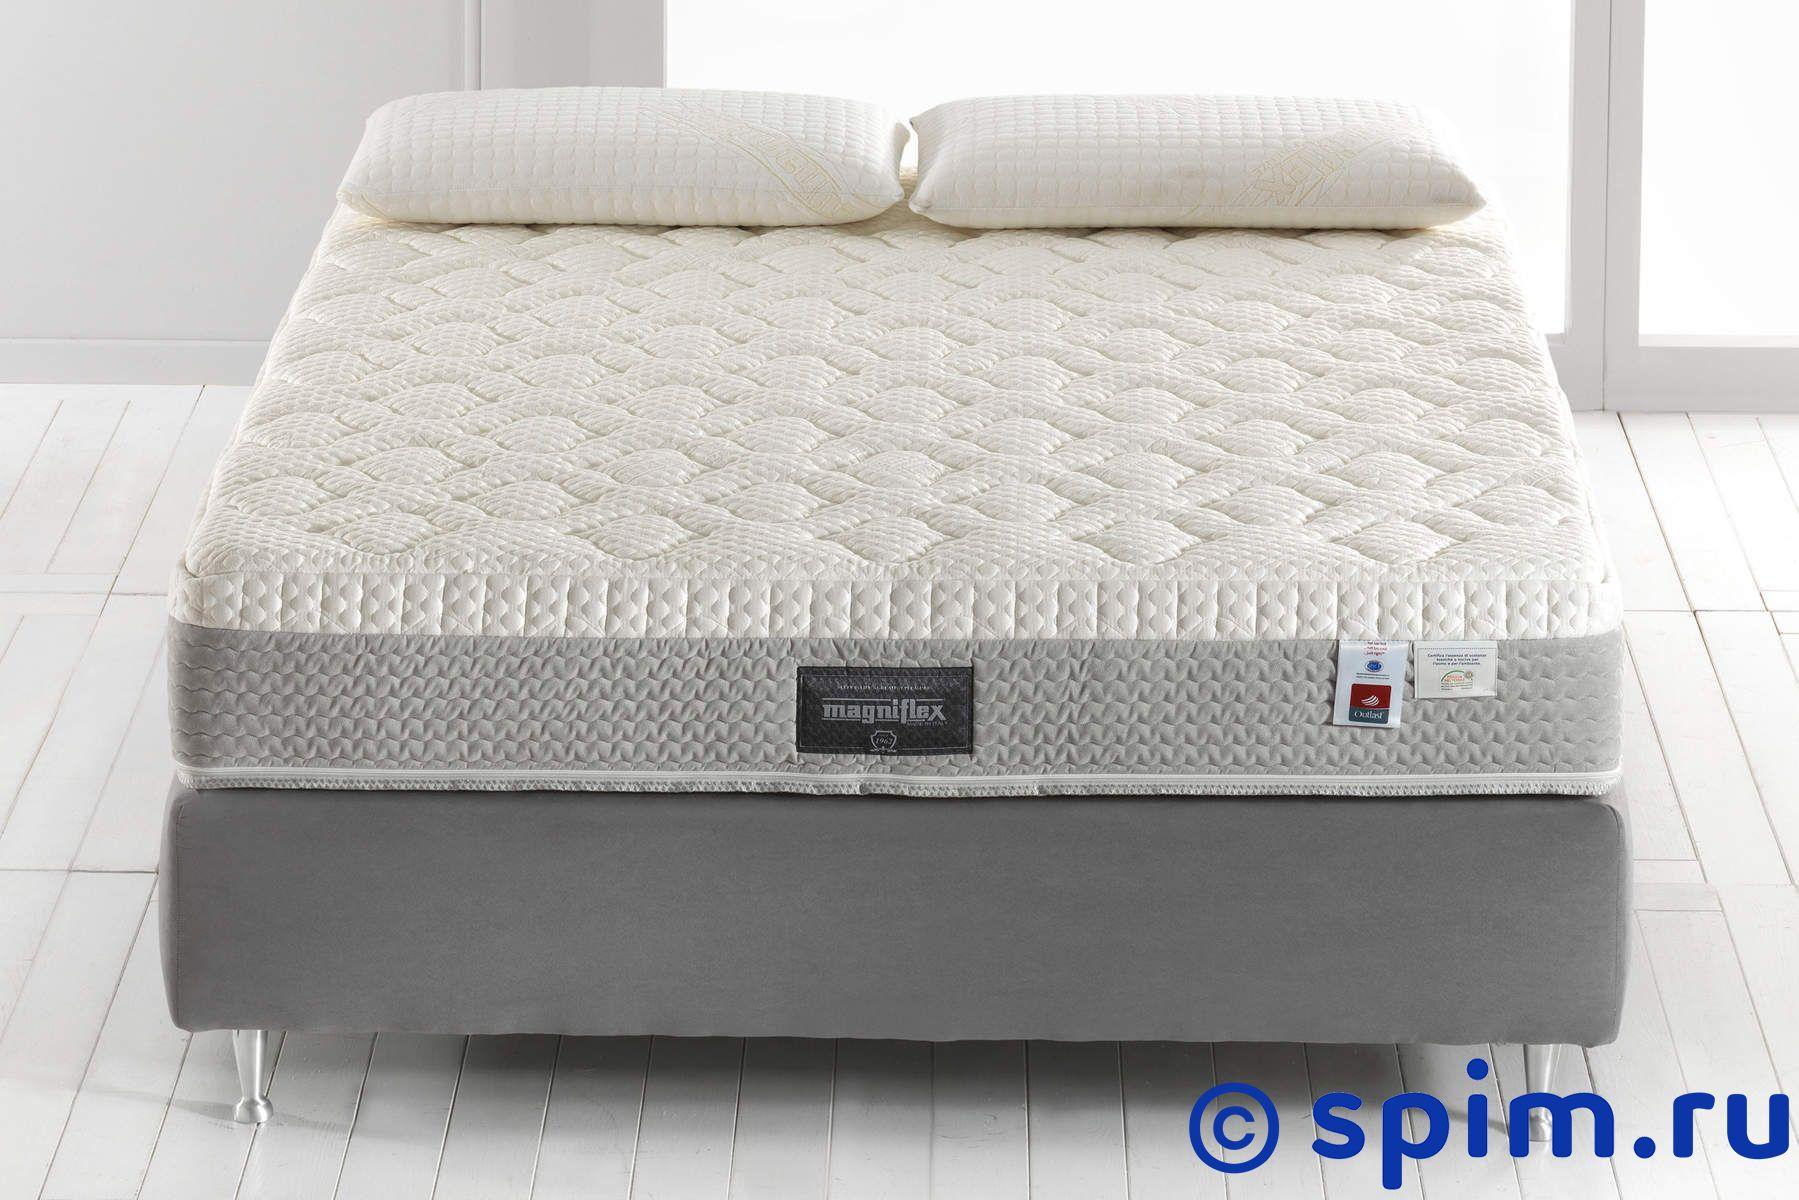 Матрас Magniflex Comfort Plus 10 160х200 см